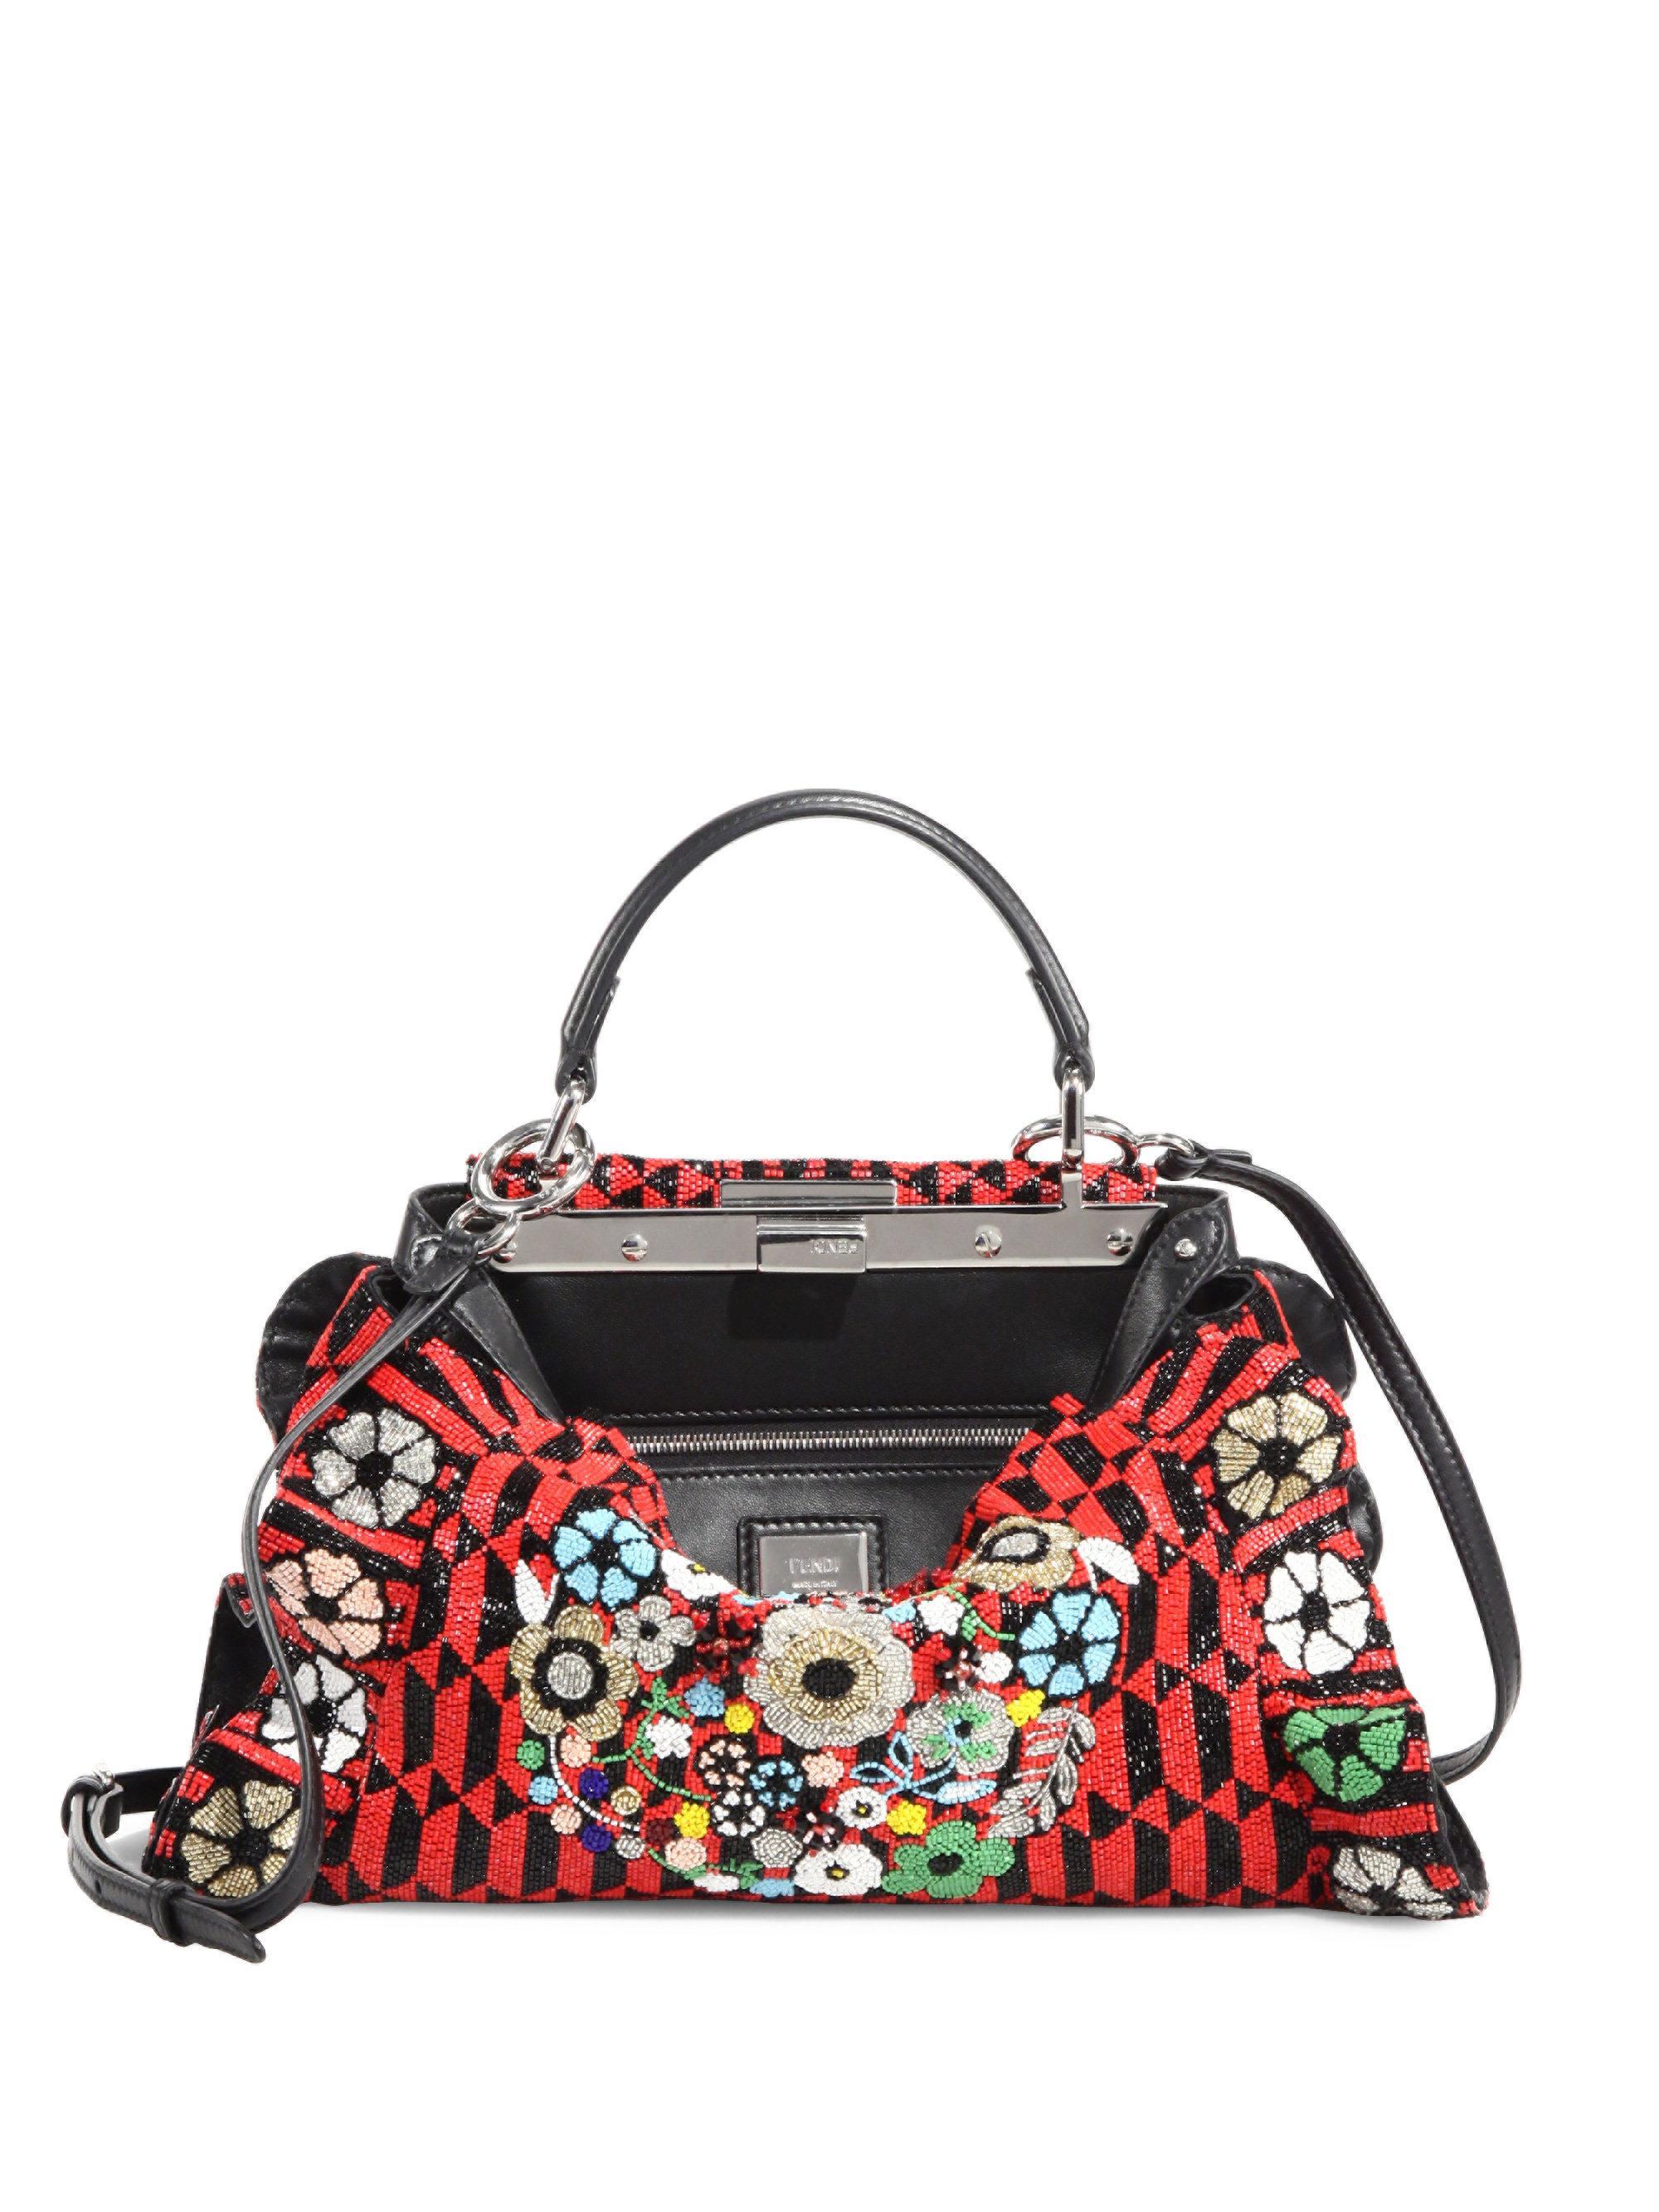 c59dc43fa3c Lyst - Fendi Mini Peekaboo Bead-embroidered Handbag